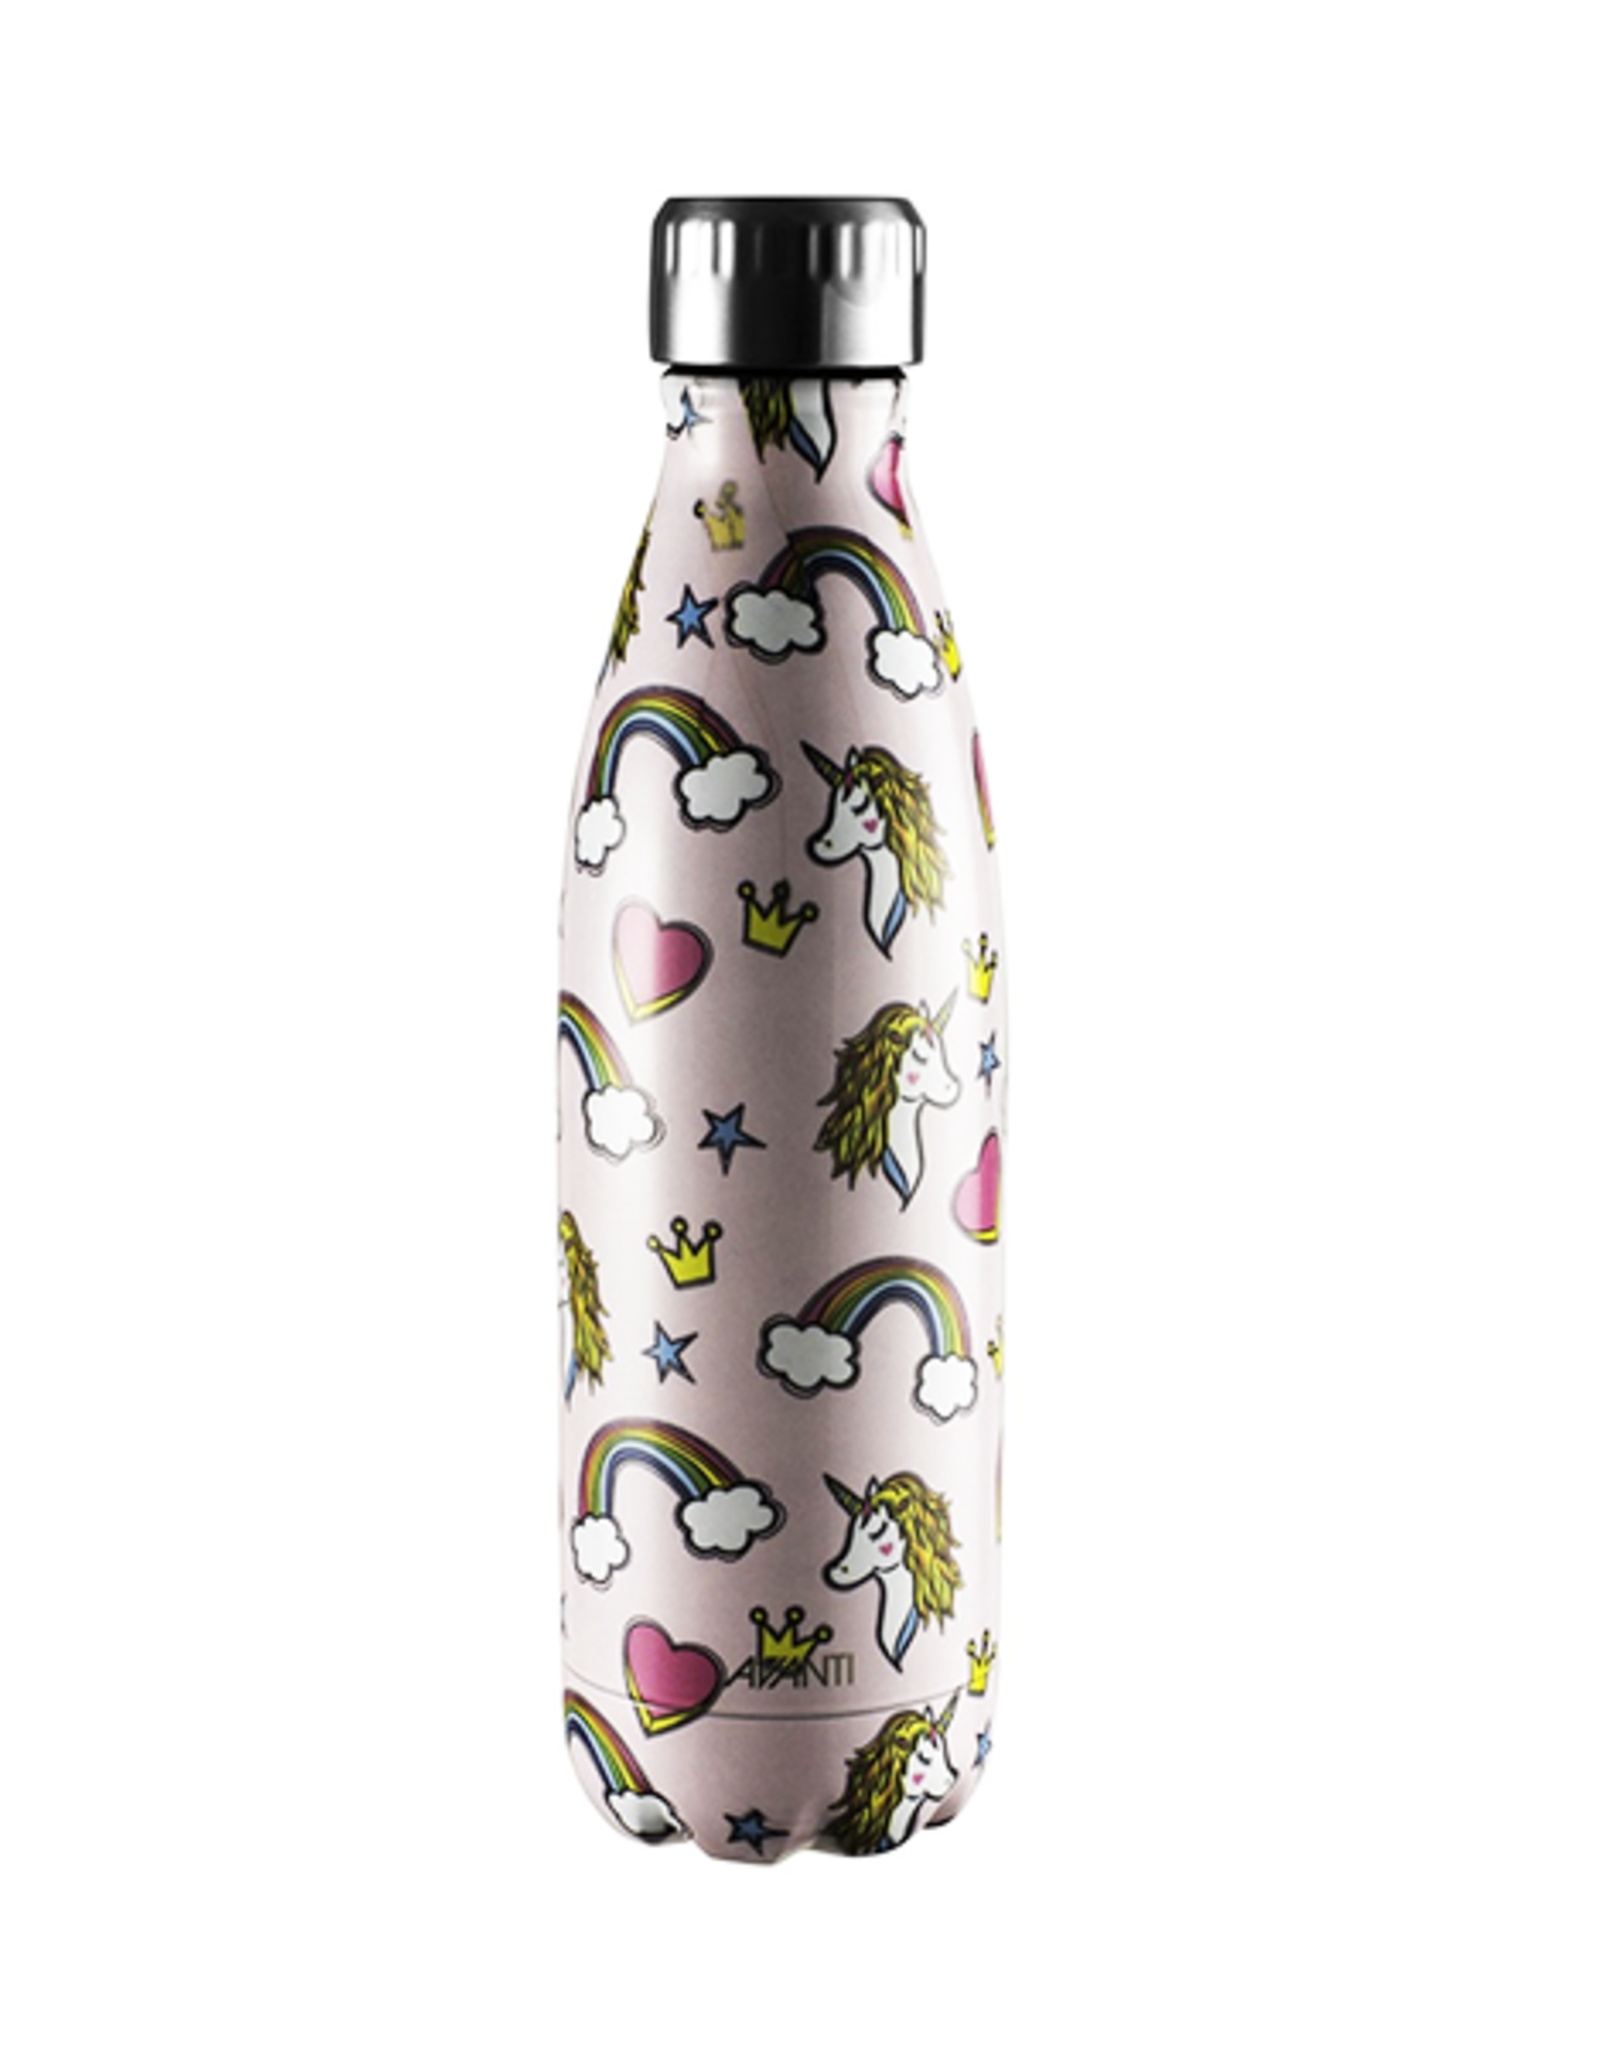 Avanti Homewares Fluid Bottle 500ml - Unicorn